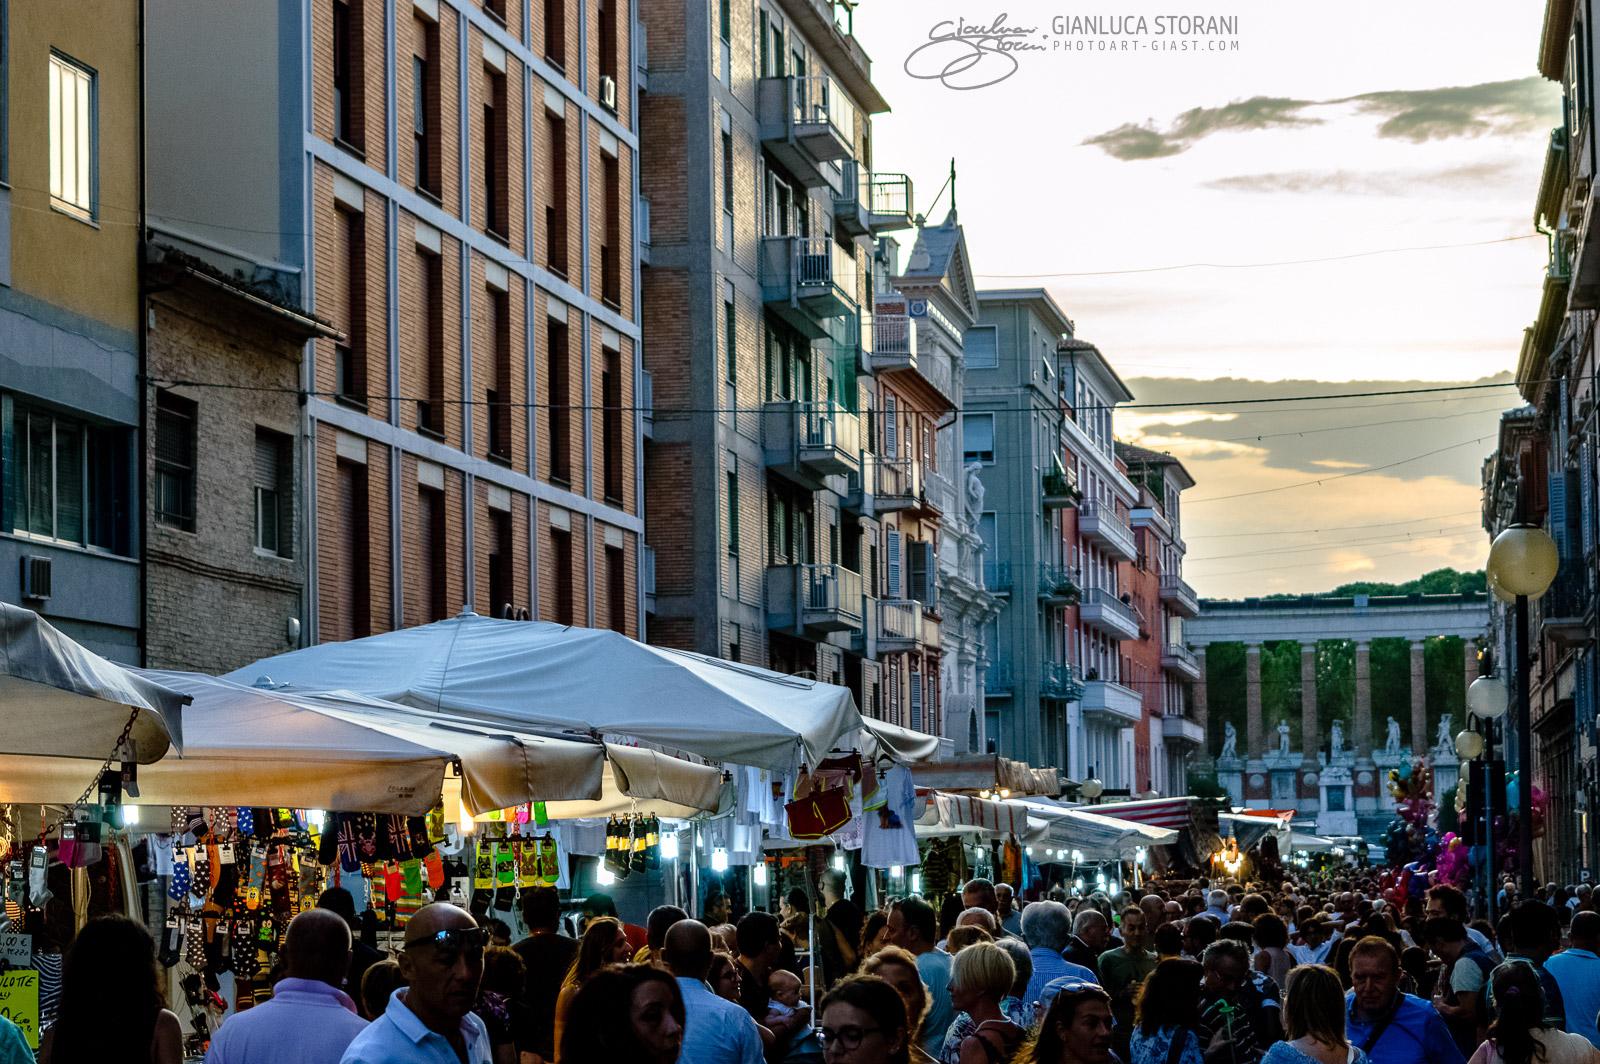 San Giuliano 2017, Corso Cavour - Gianluca Storani Photo Art  (ID: 4-2569)